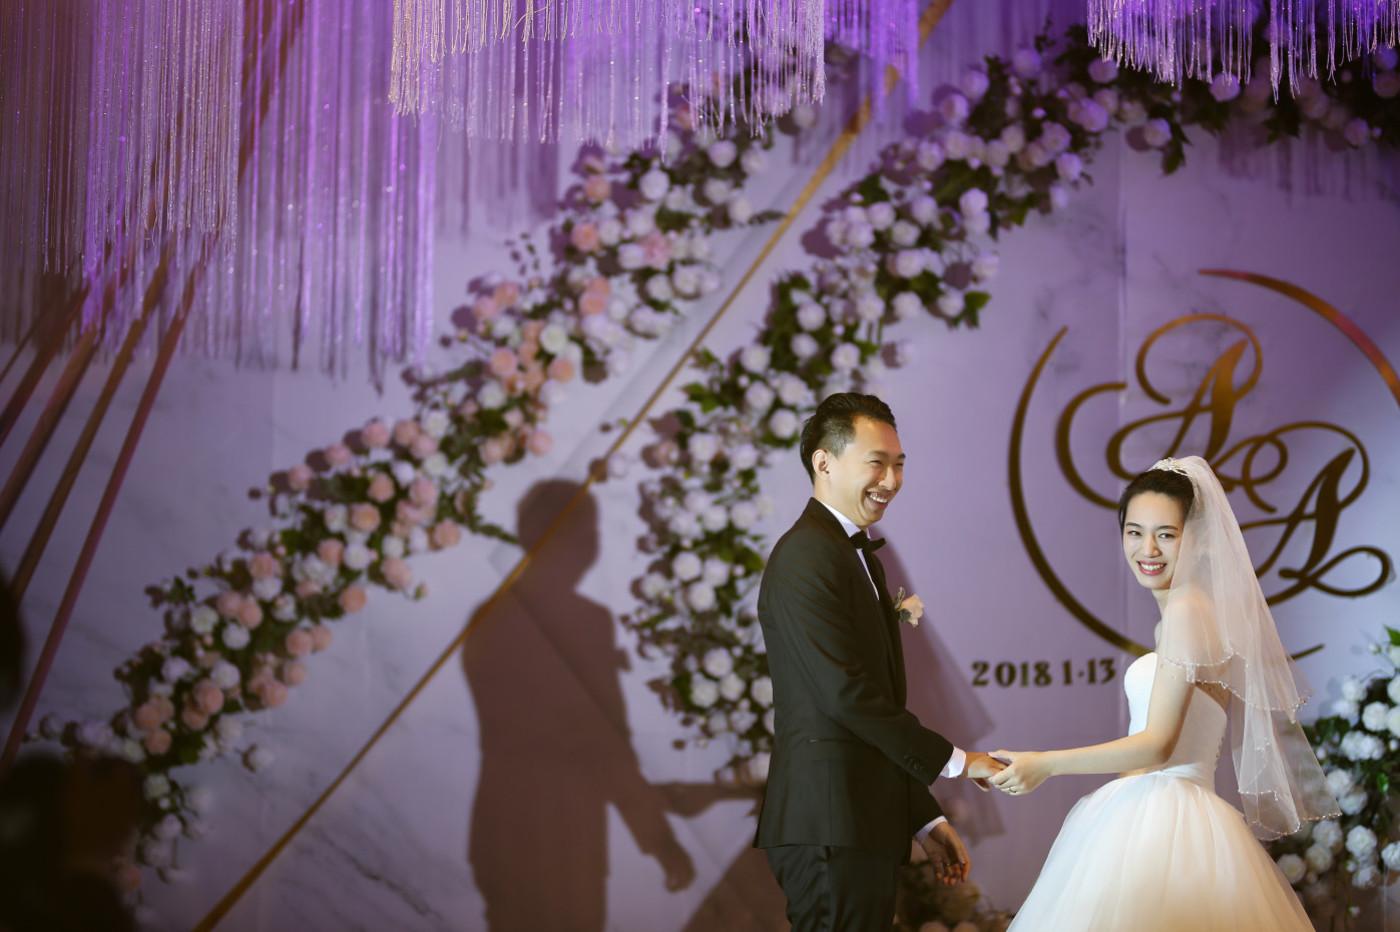 【KAI 婚礼纪实】Z&Y 常州婚礼30